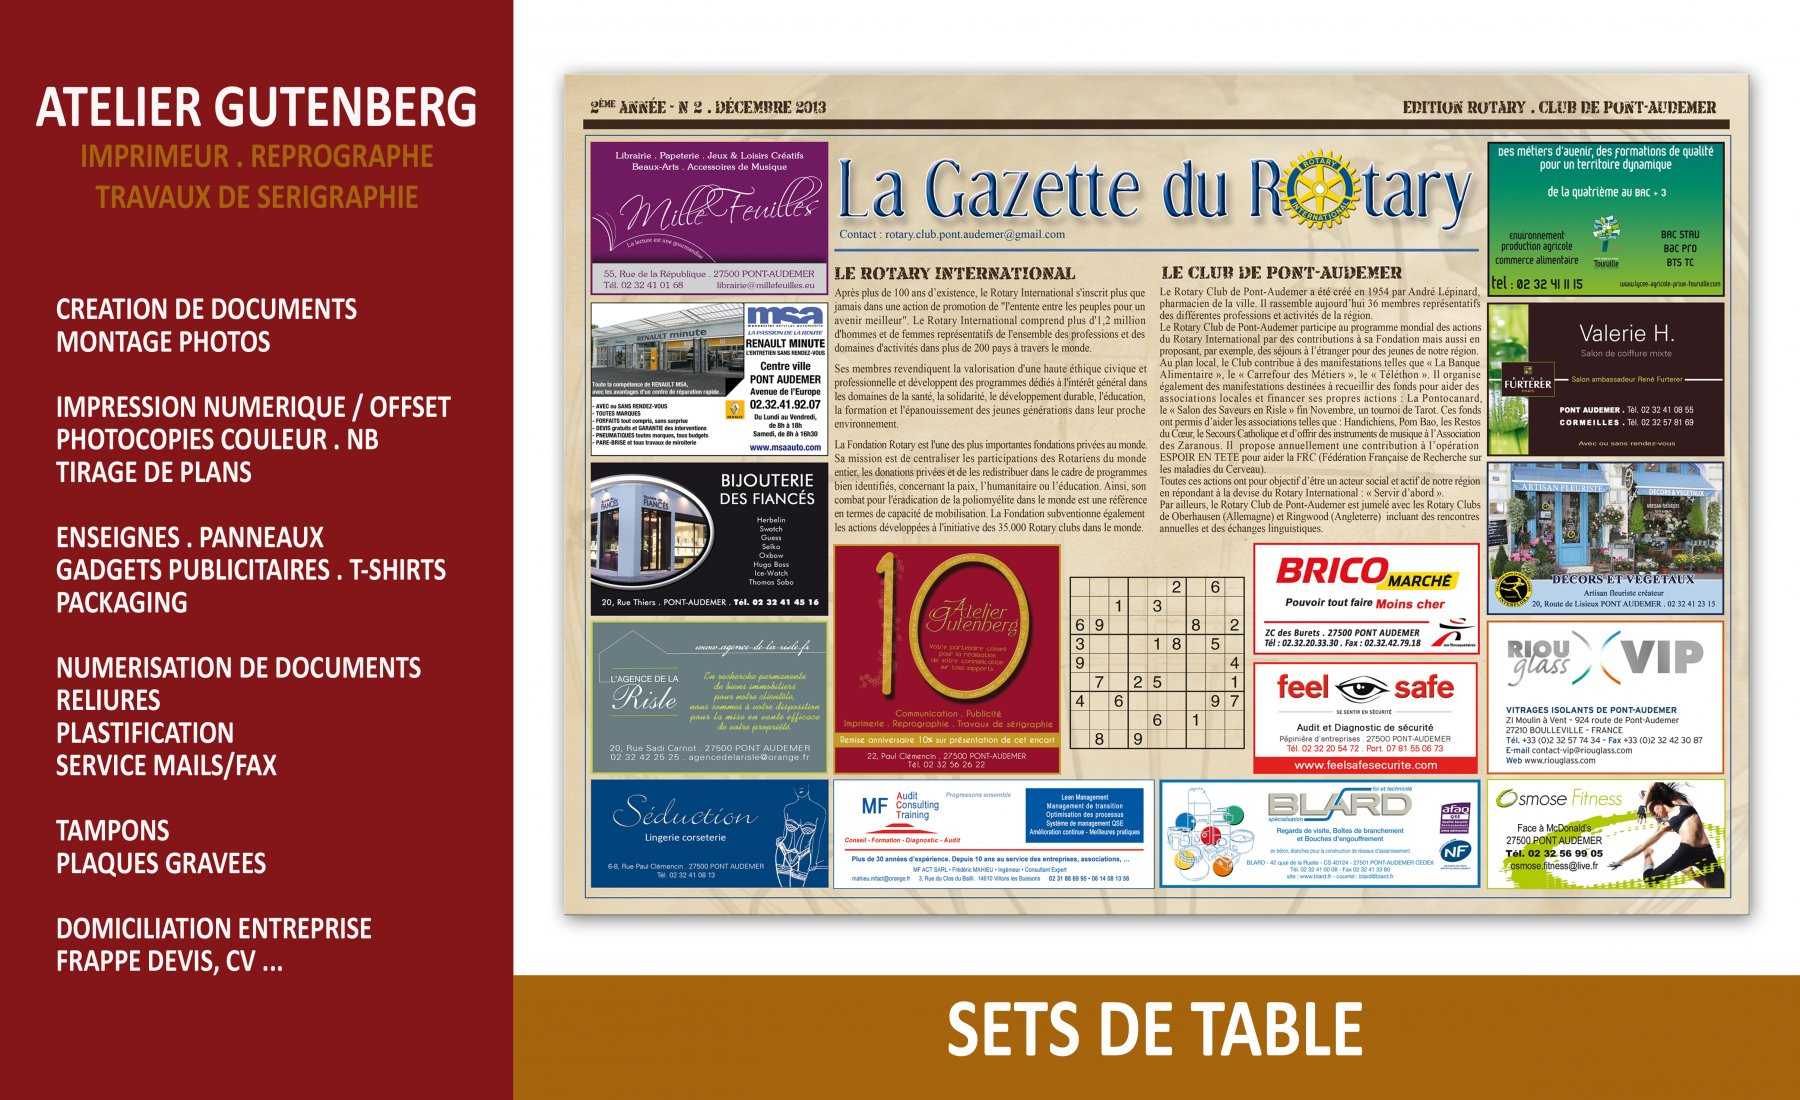 atelier gutenberg set de table du rotary format 29.7 x 42